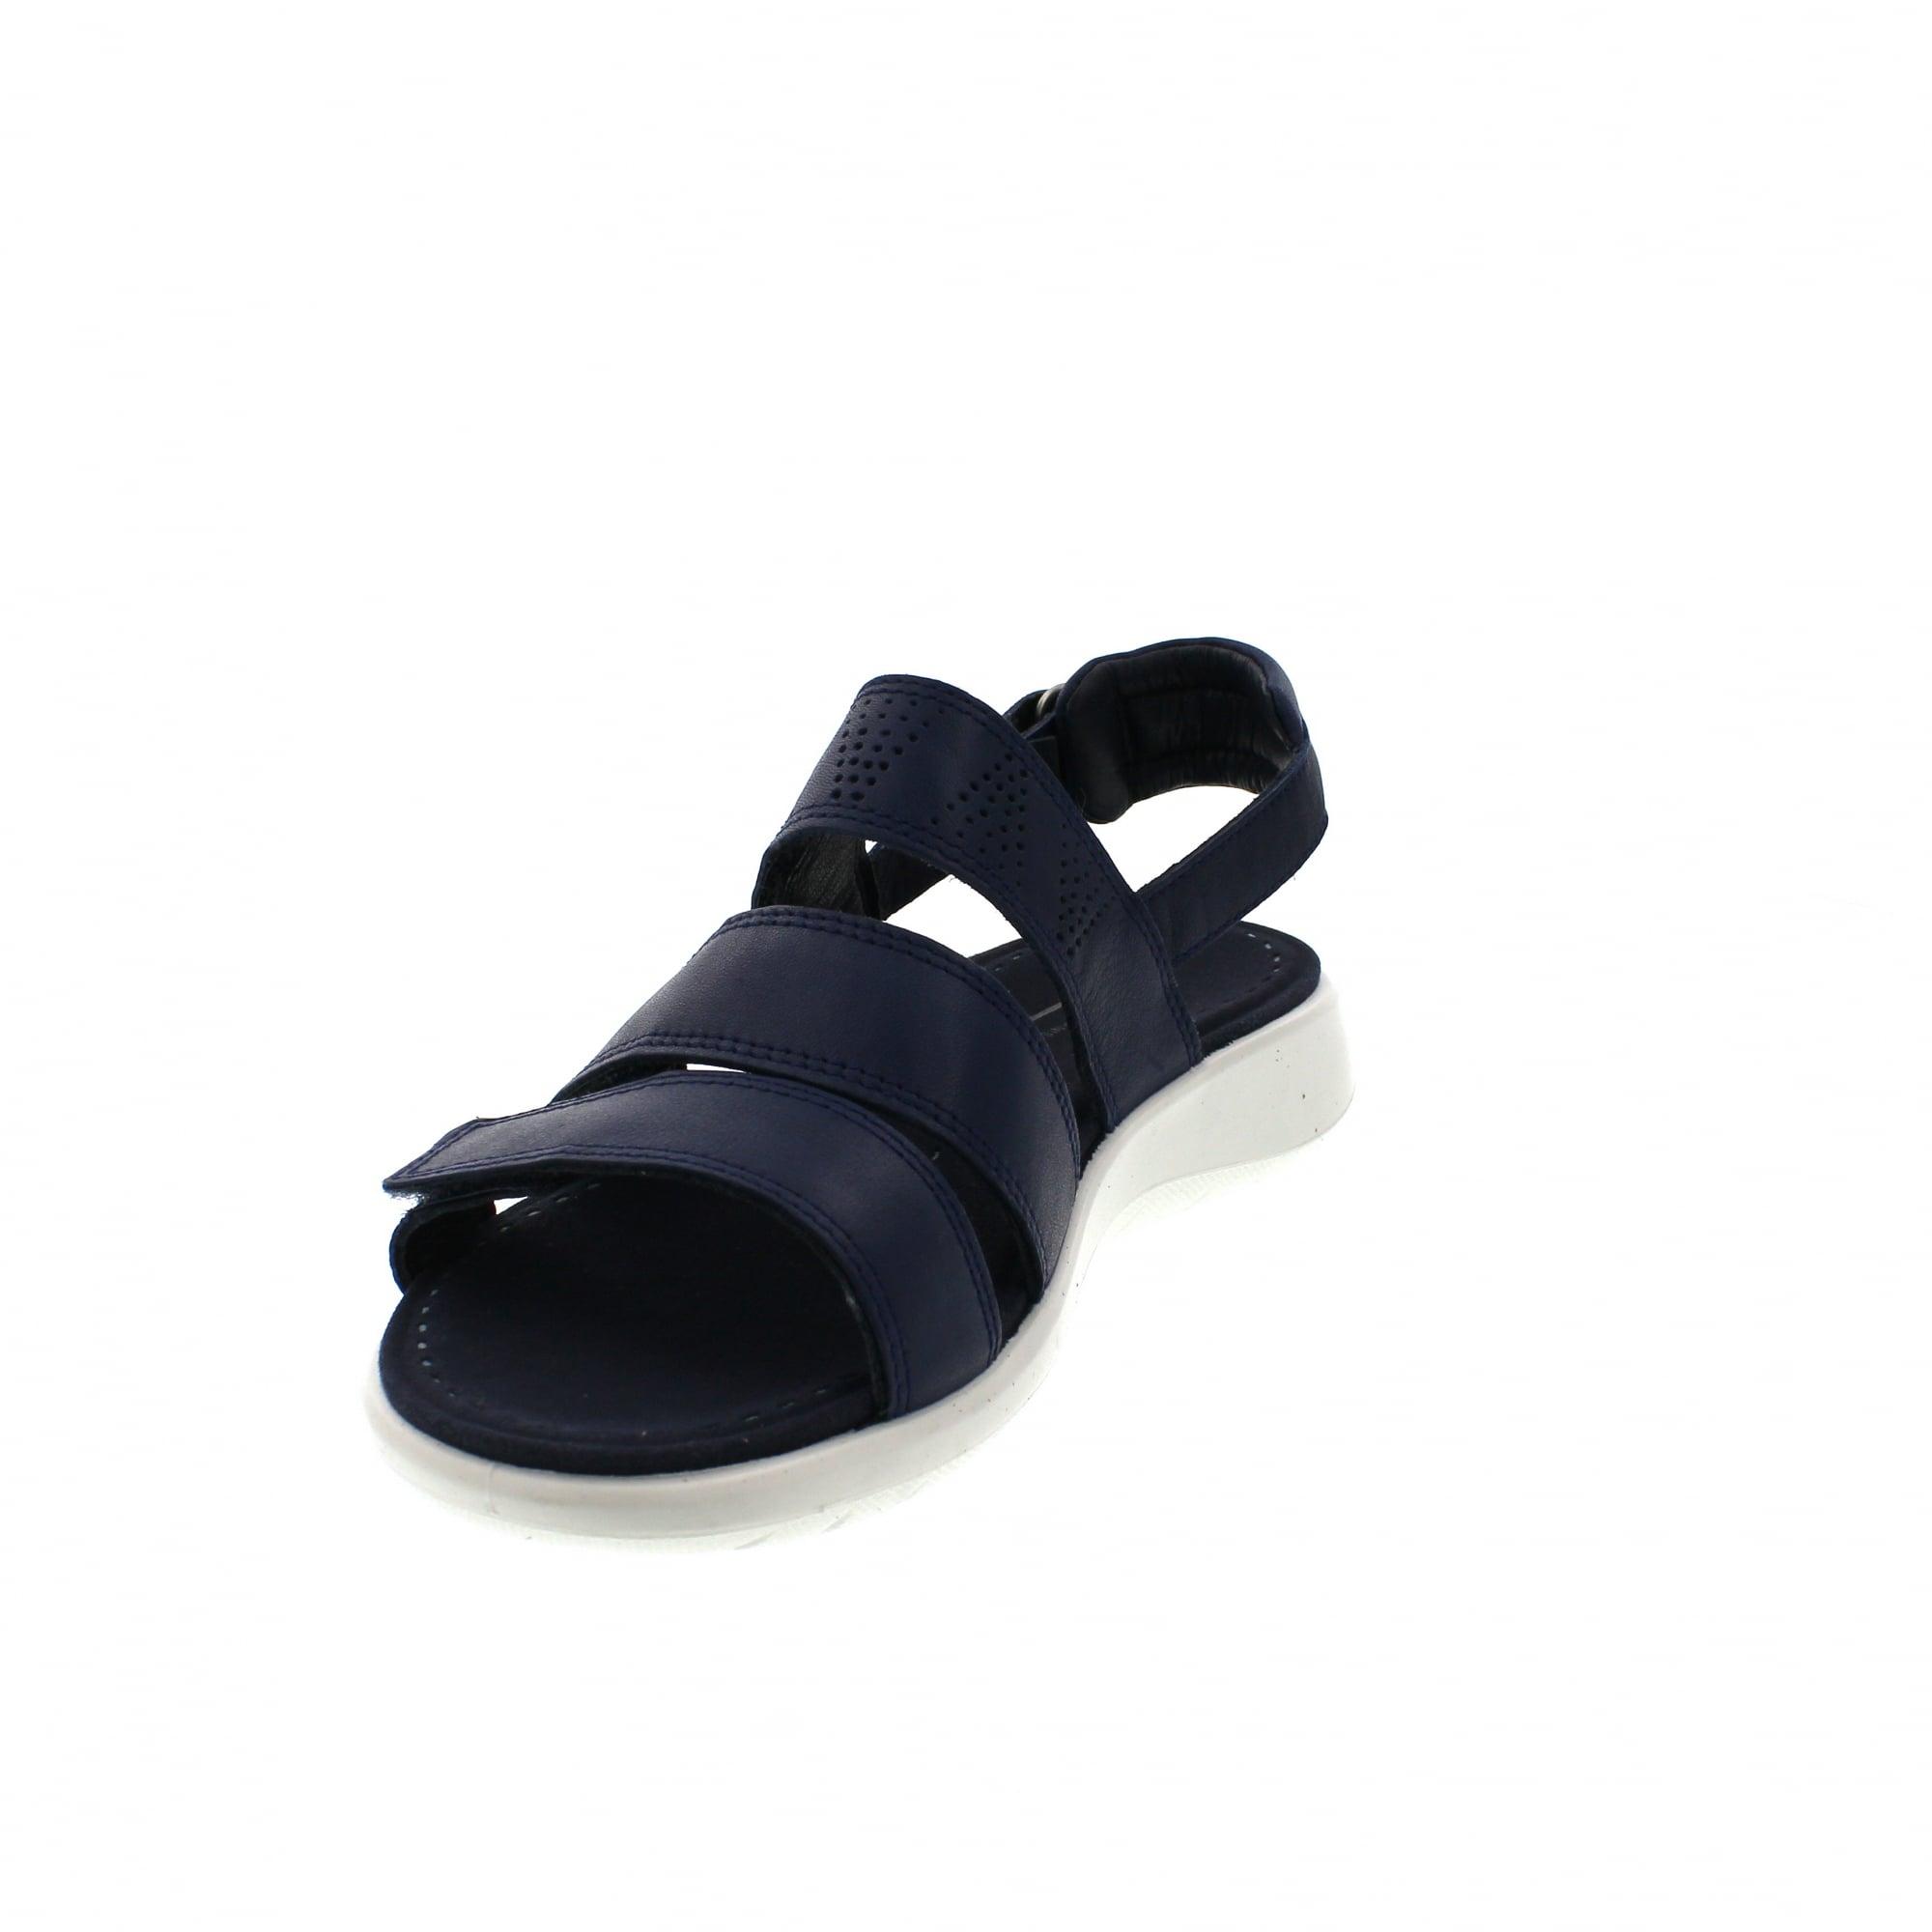 Soft 5 Sandal | 218523 01048